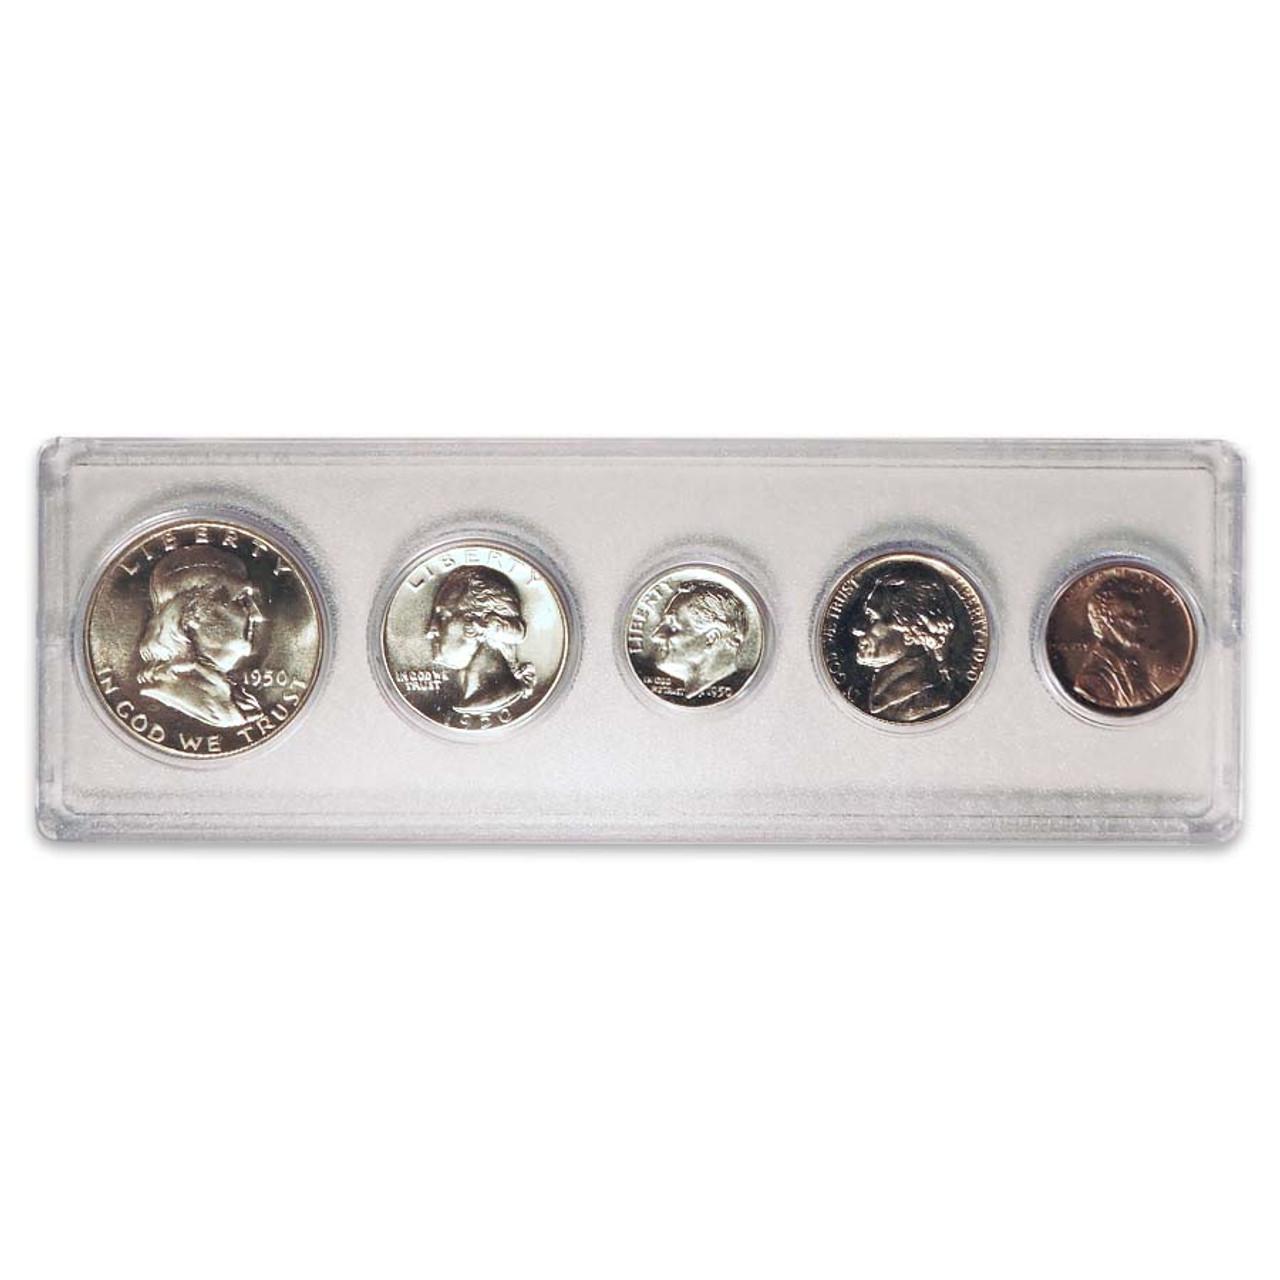 1950 Proof Set 5 Coins Image 1